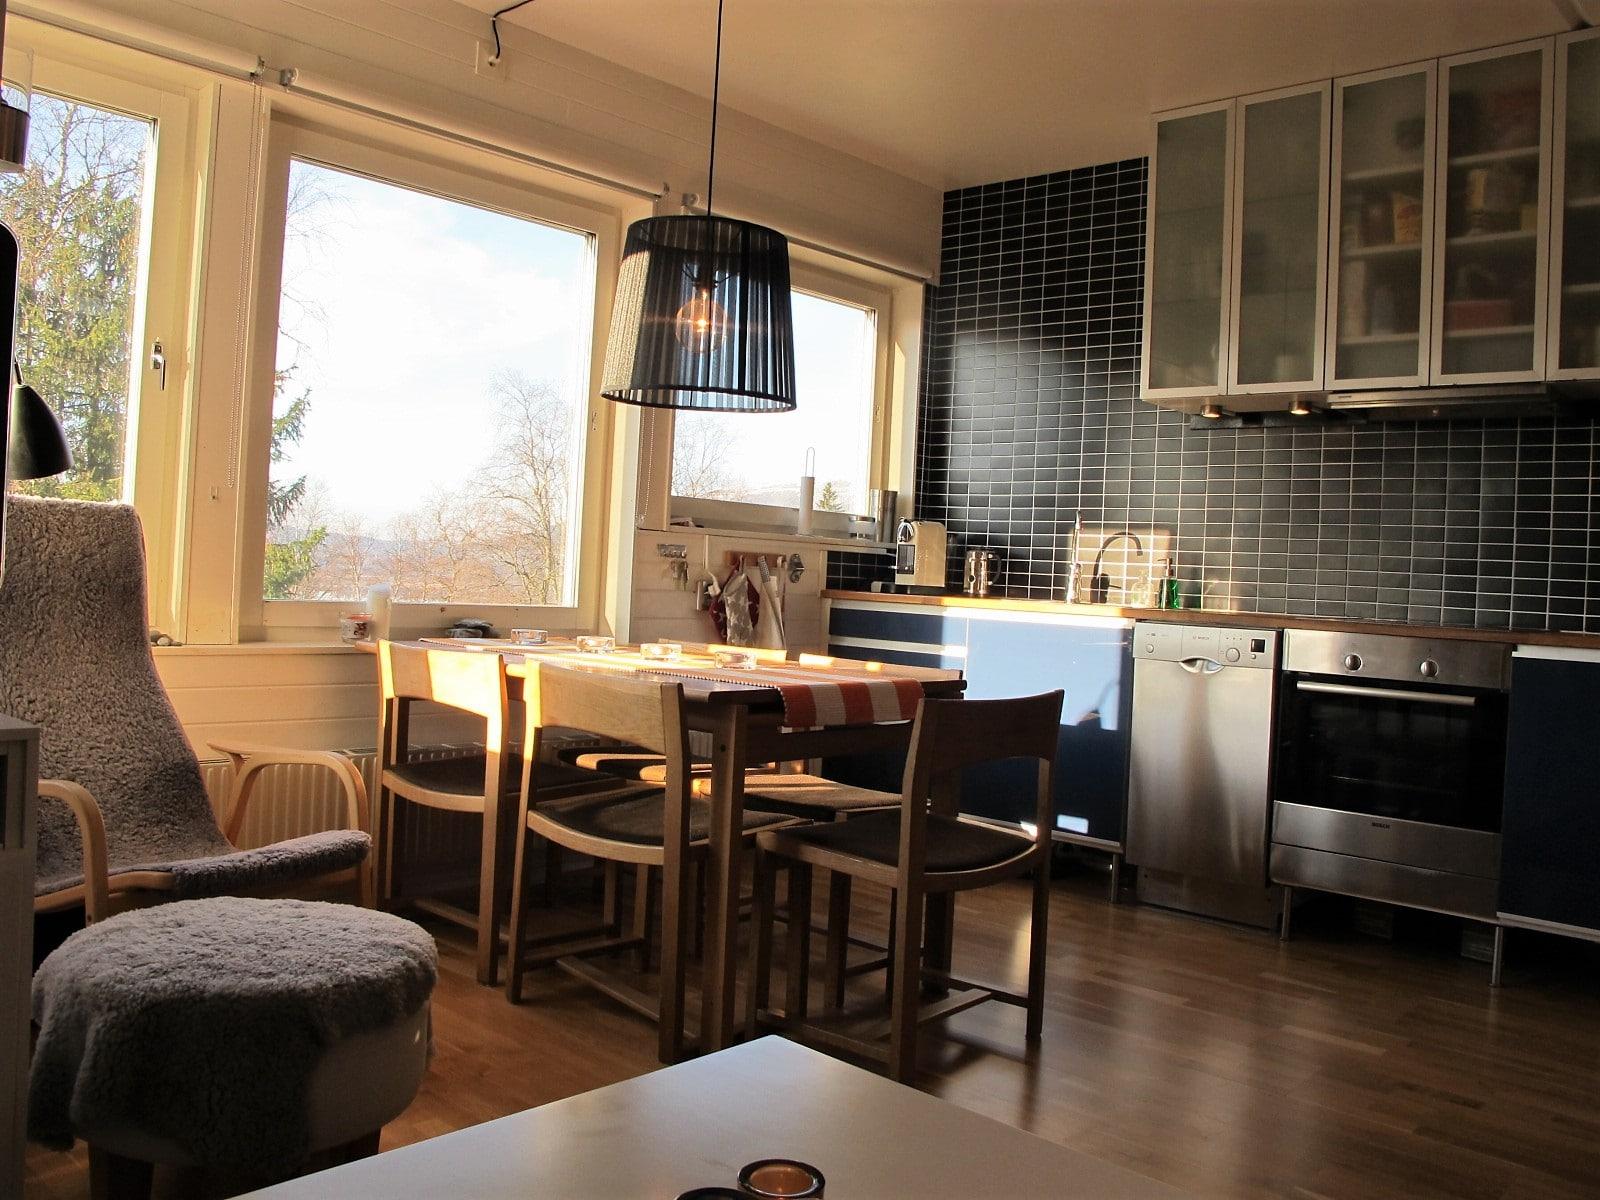 Kök i mörk stil i Hummeln i Åre